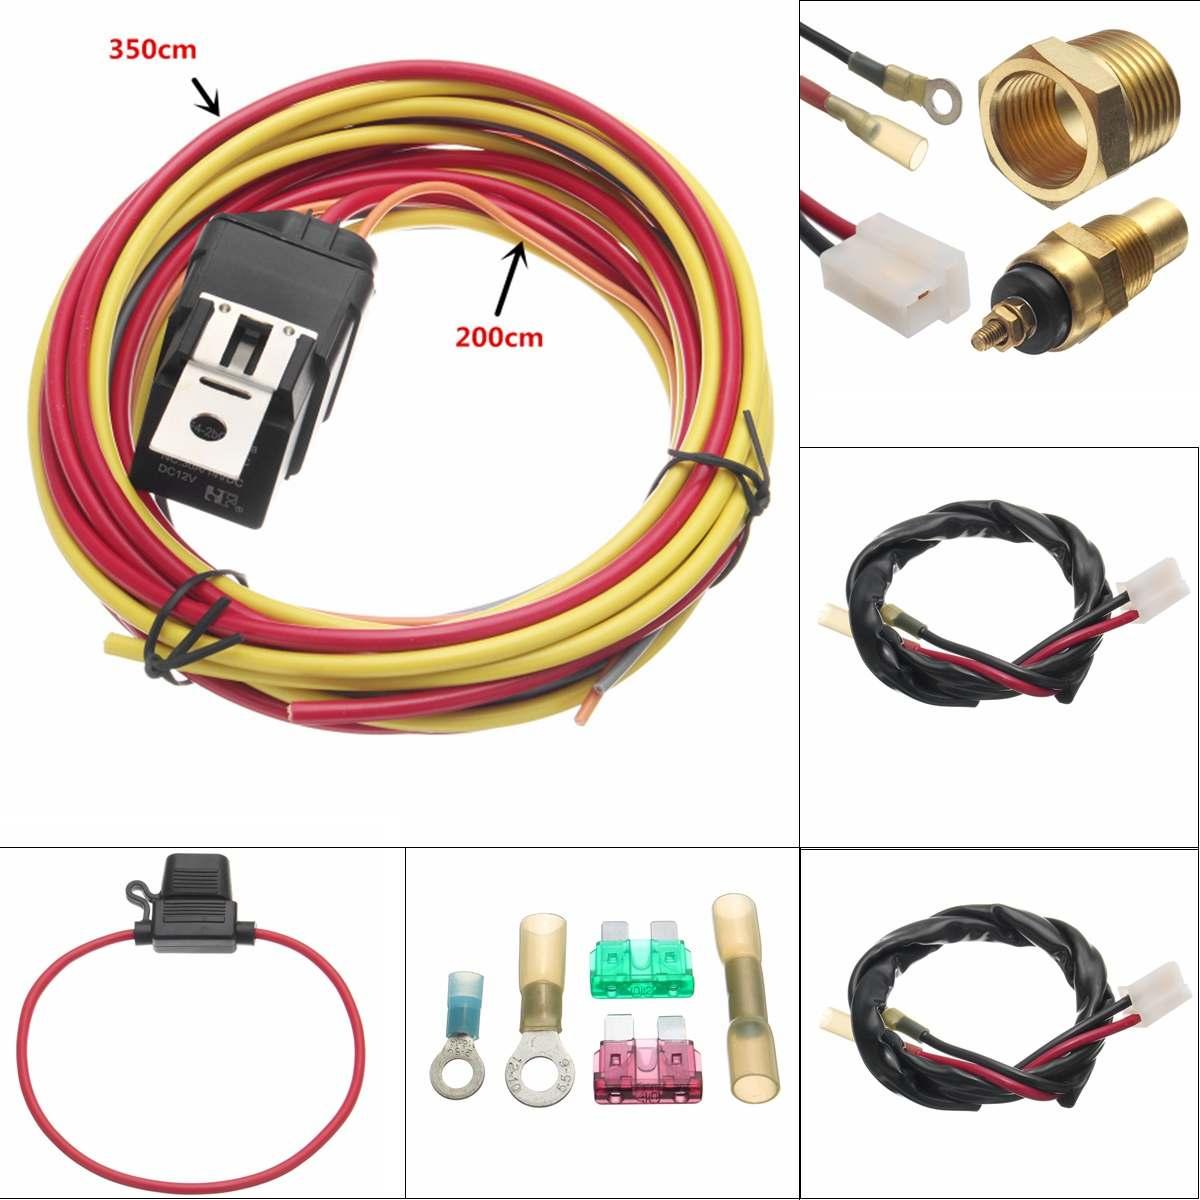 Electric Fan Relay Wiring Harness Heavy Duty Thermostat Dual Sensor Kit Waterproof Wiring Harness Overload Circuit Breaker hopkins 40215 plug in simple vehicle wiring kit